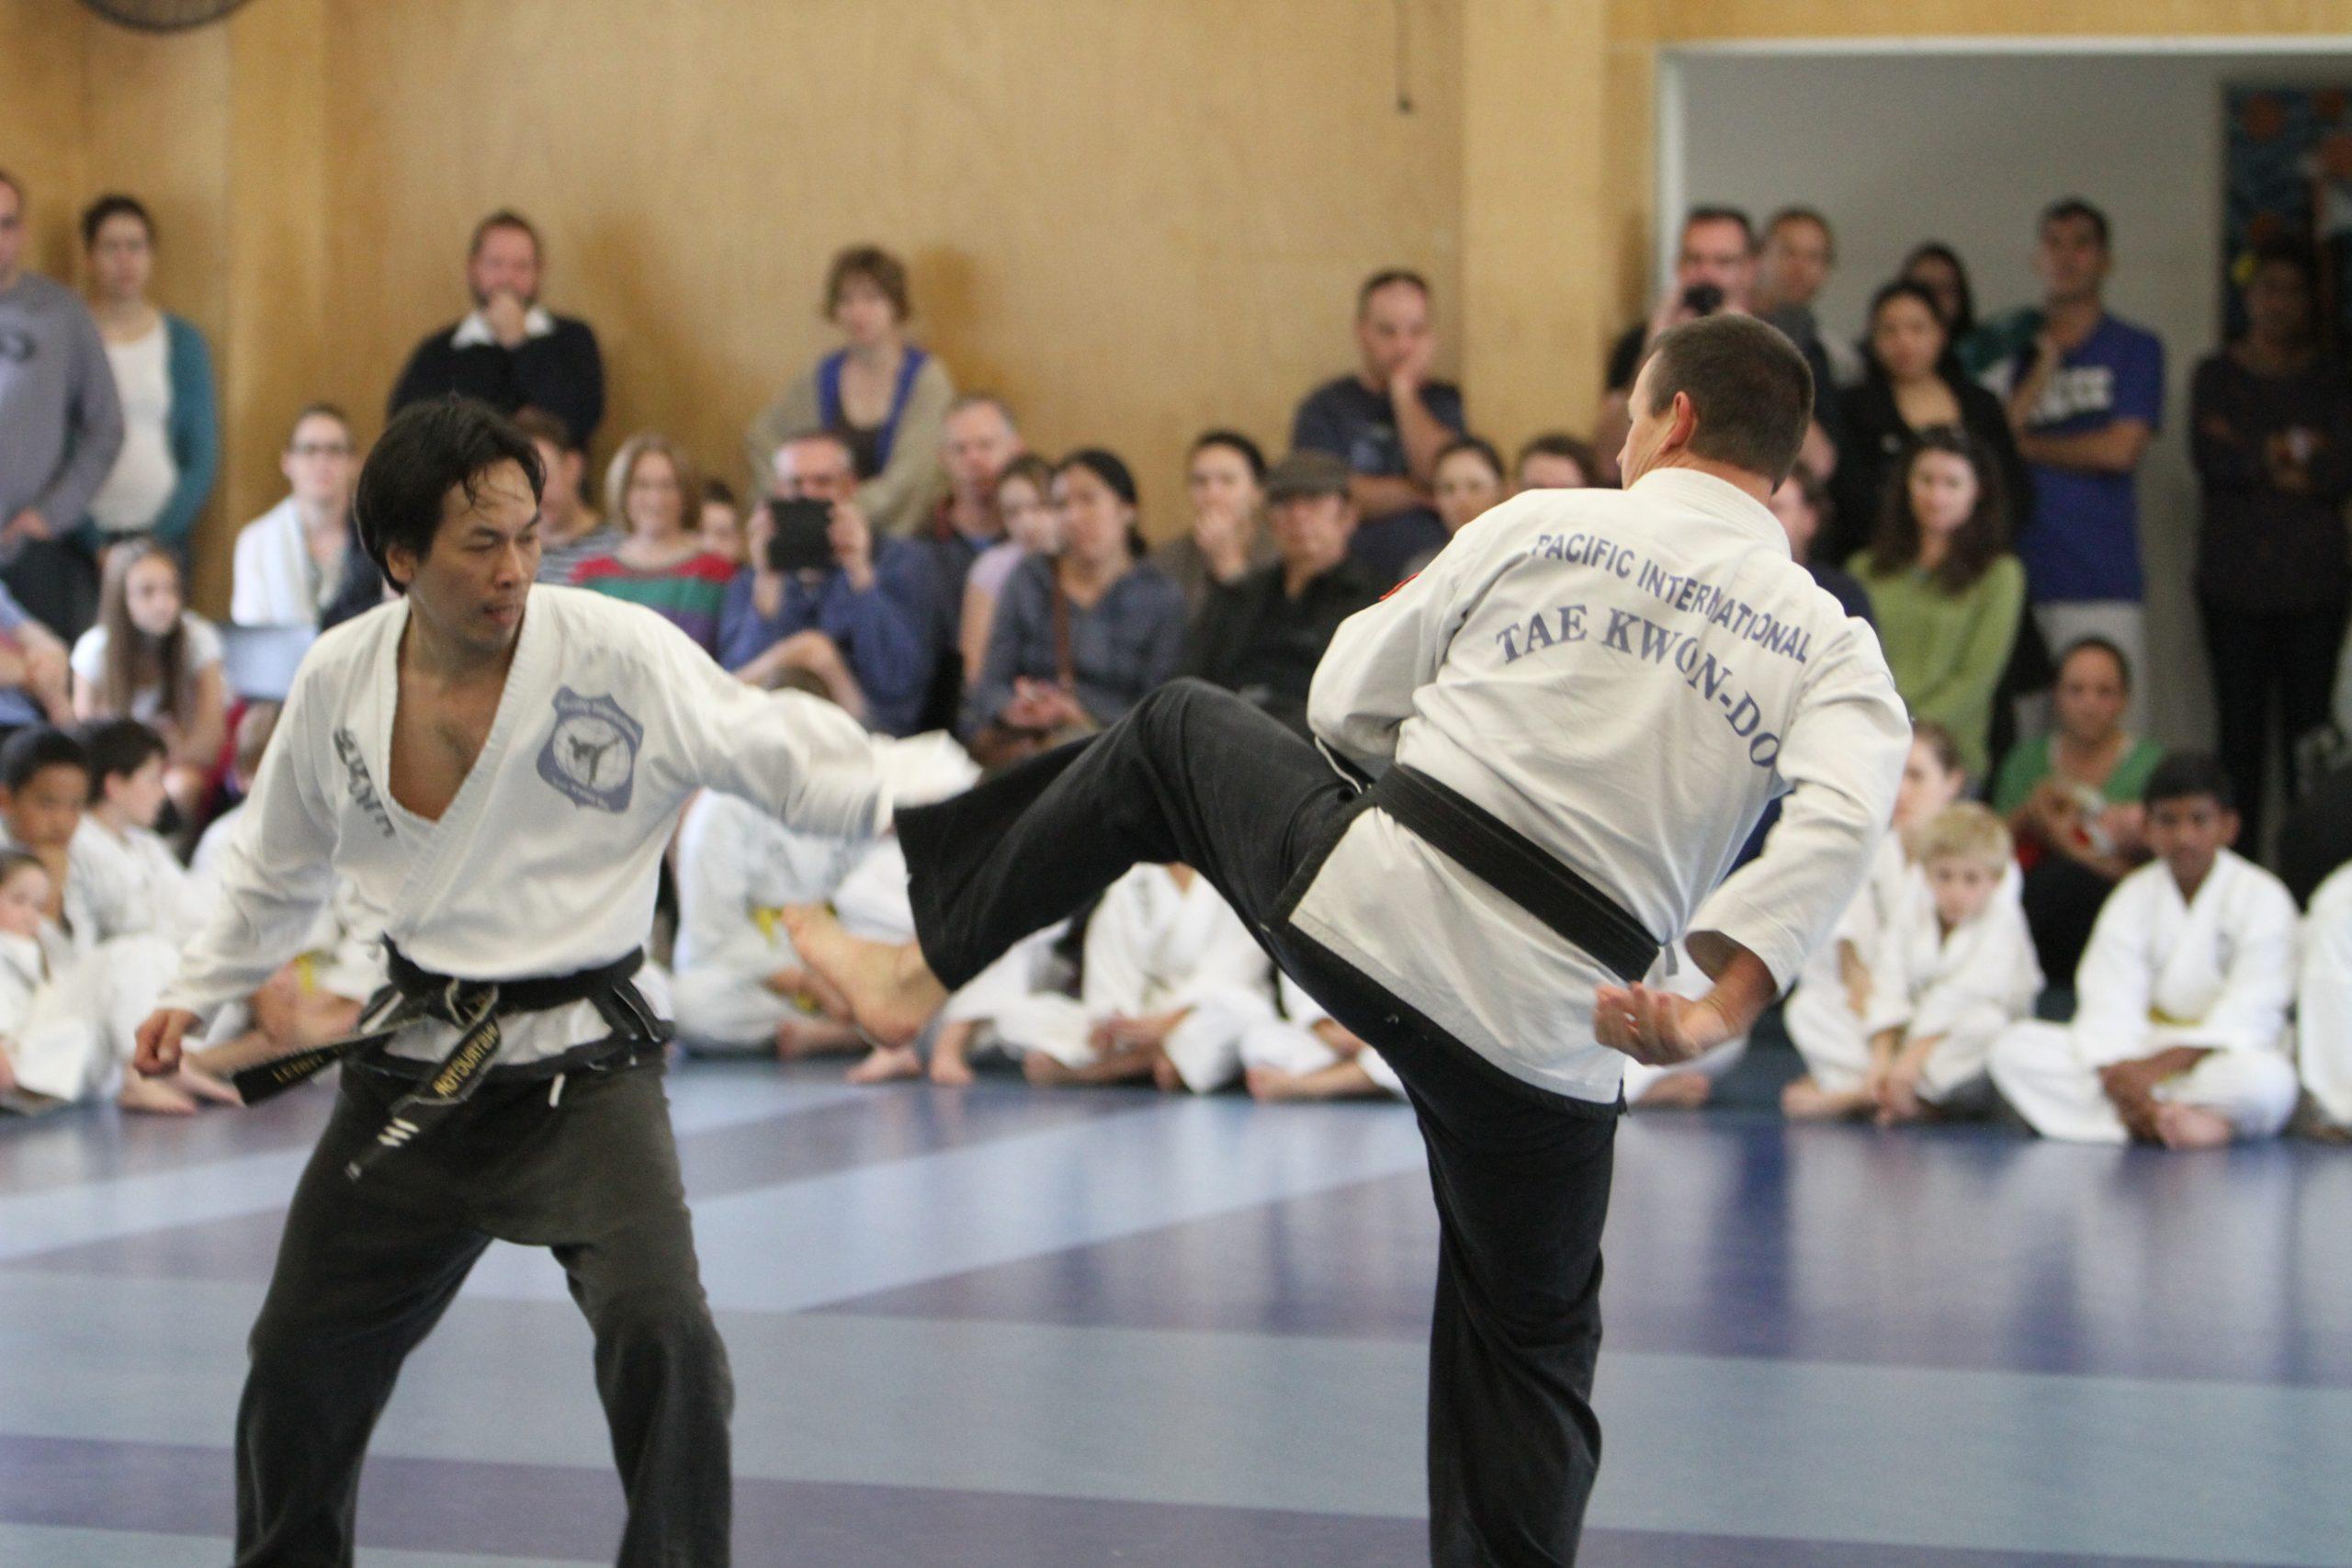 Taekwondo lessons for adults